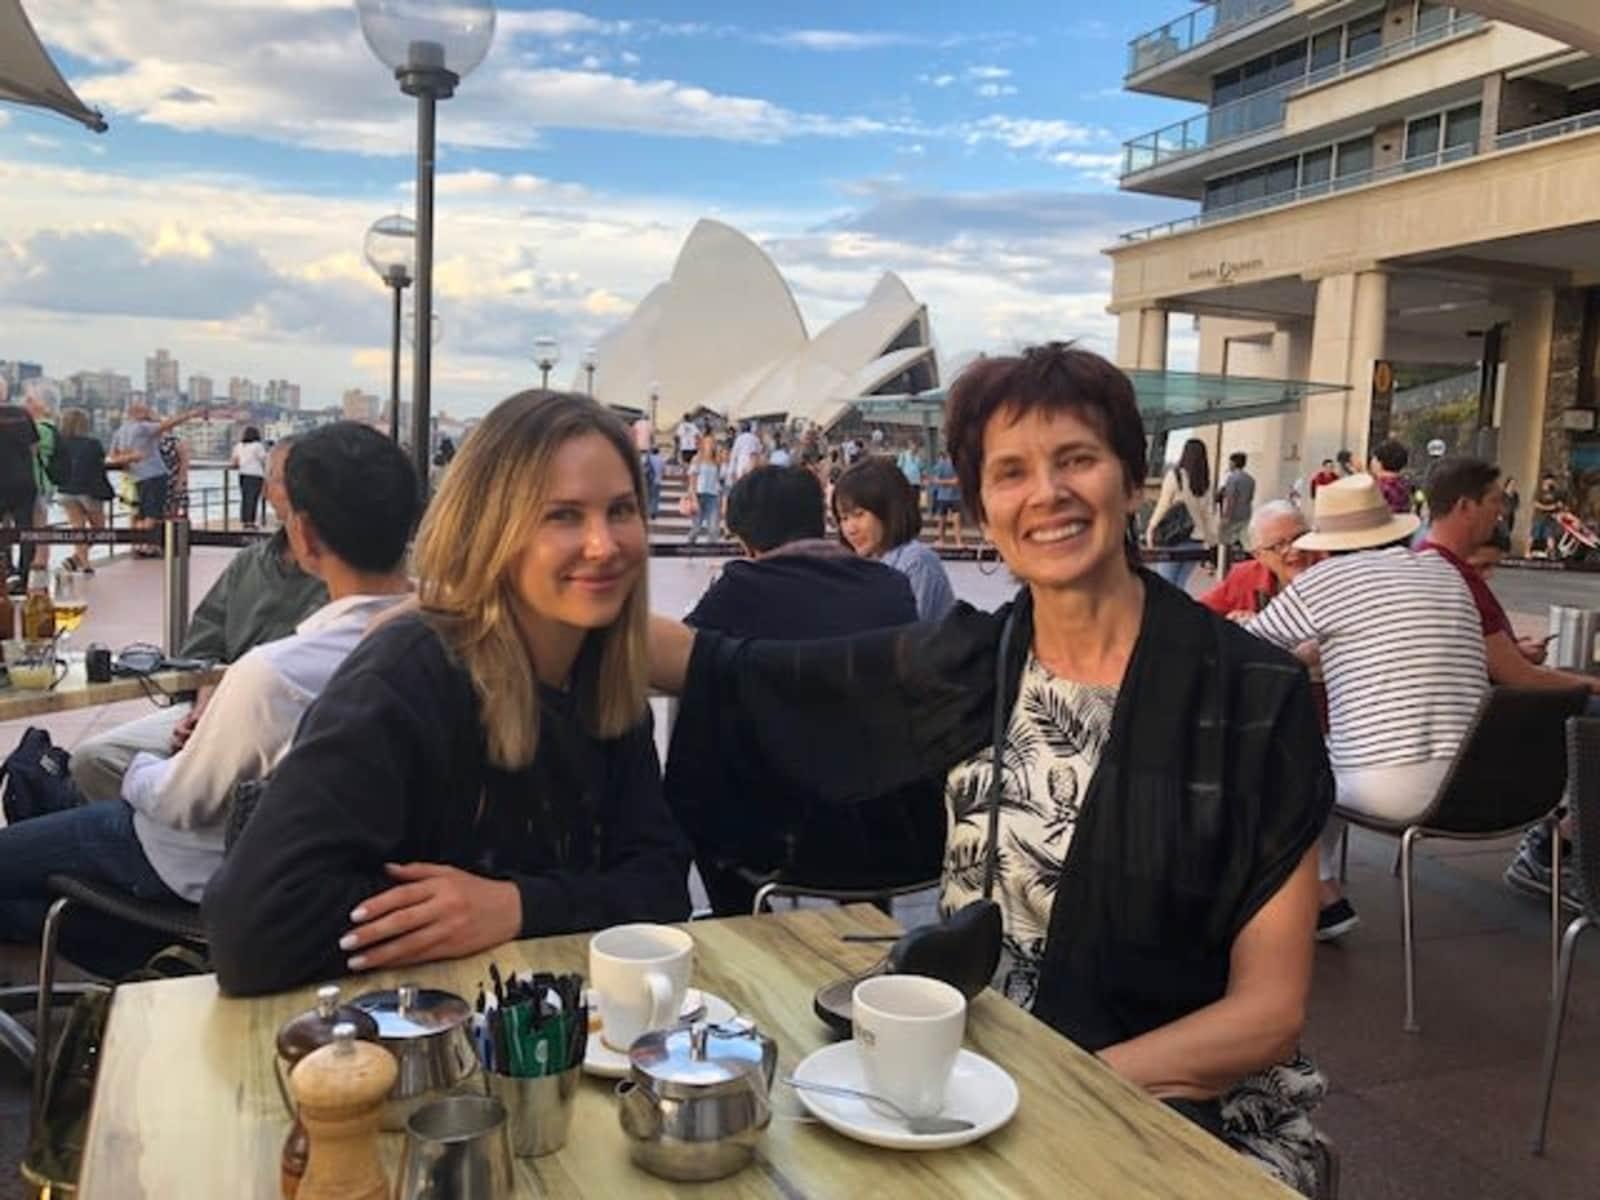 Brenda from Sydney, New South Wales, Australia